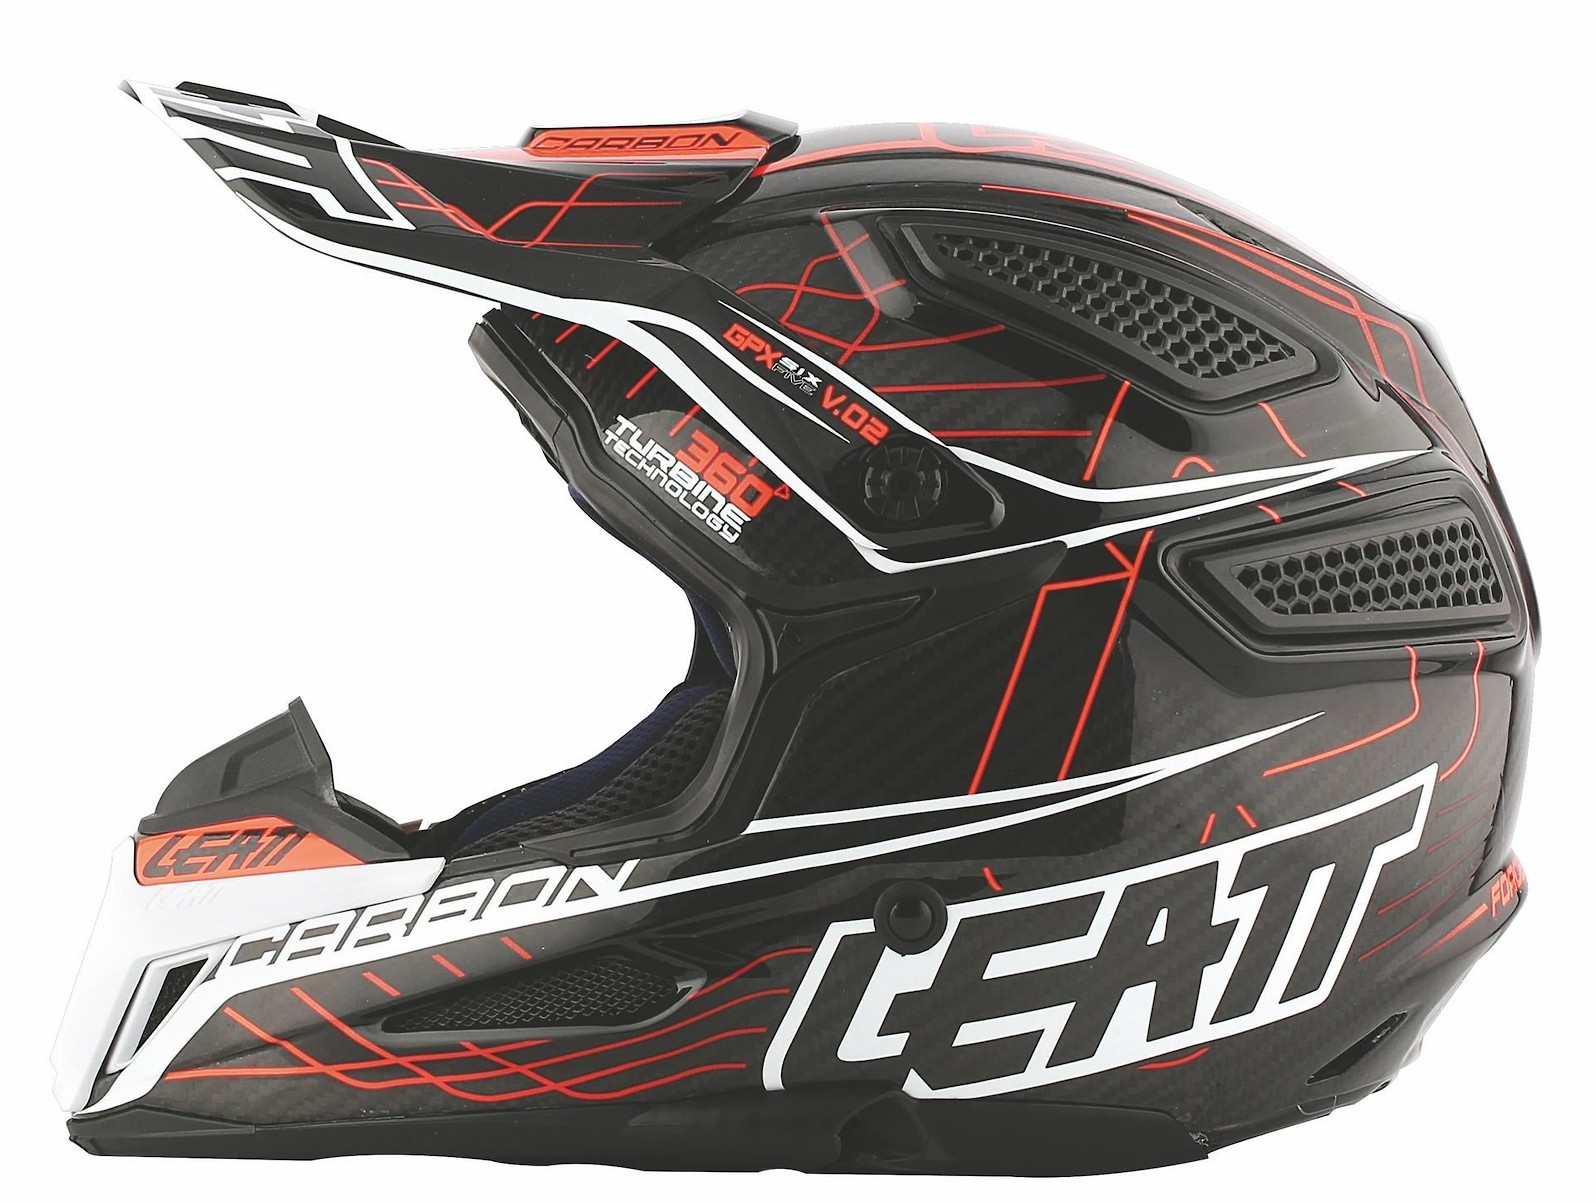 helmet_gpx_6.5_carb_jr_v02_org-blk-gry_1_